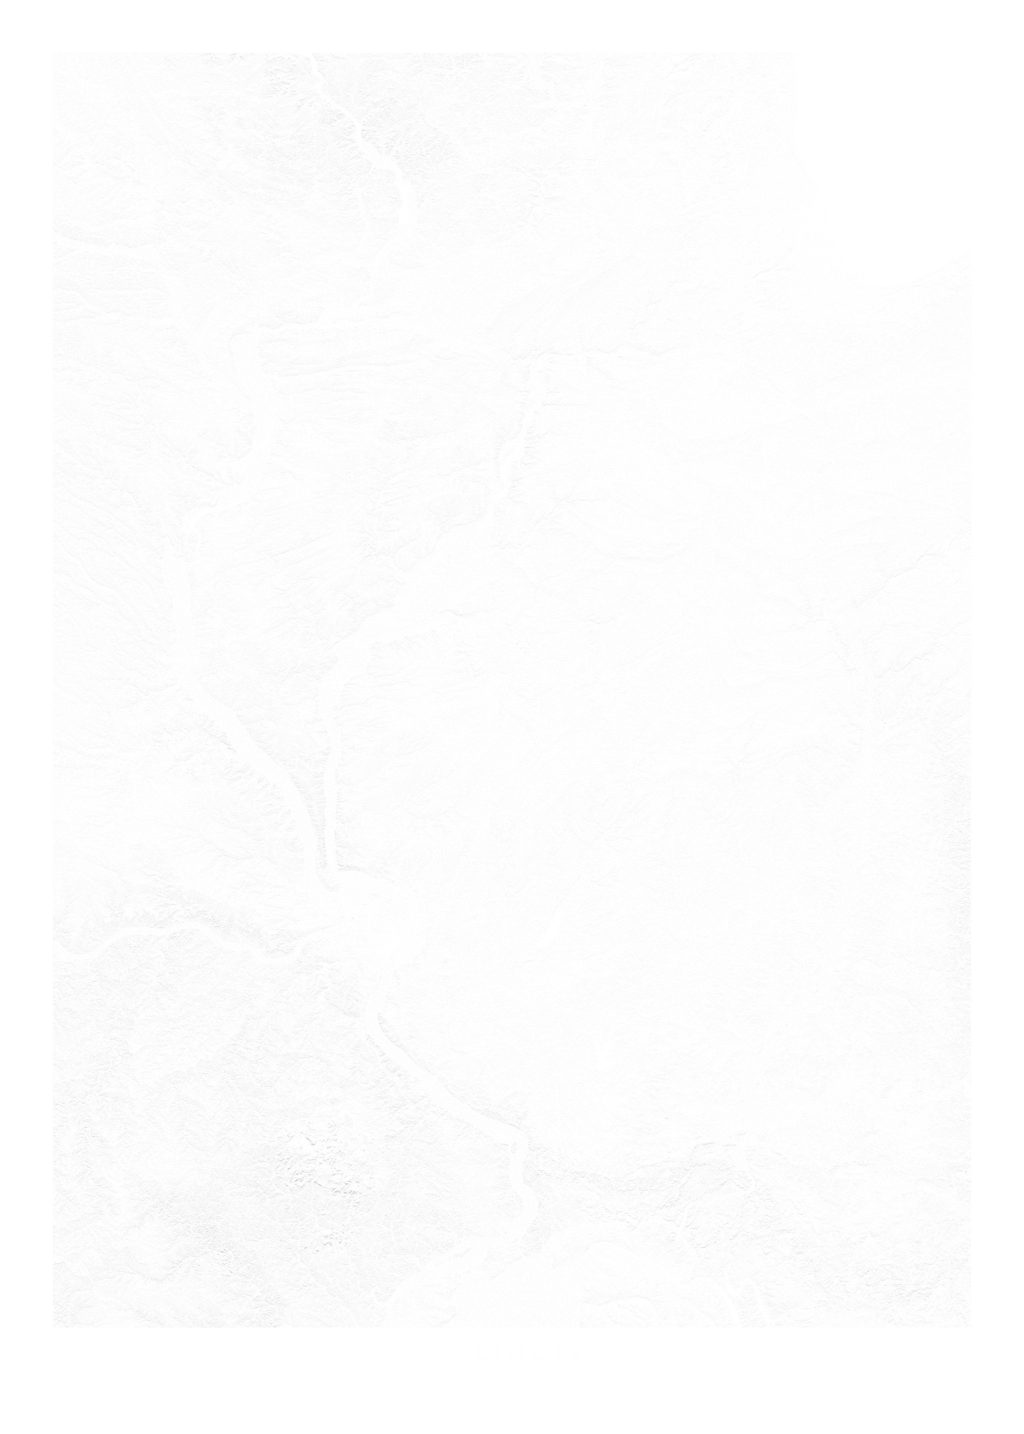 Illinois wall map